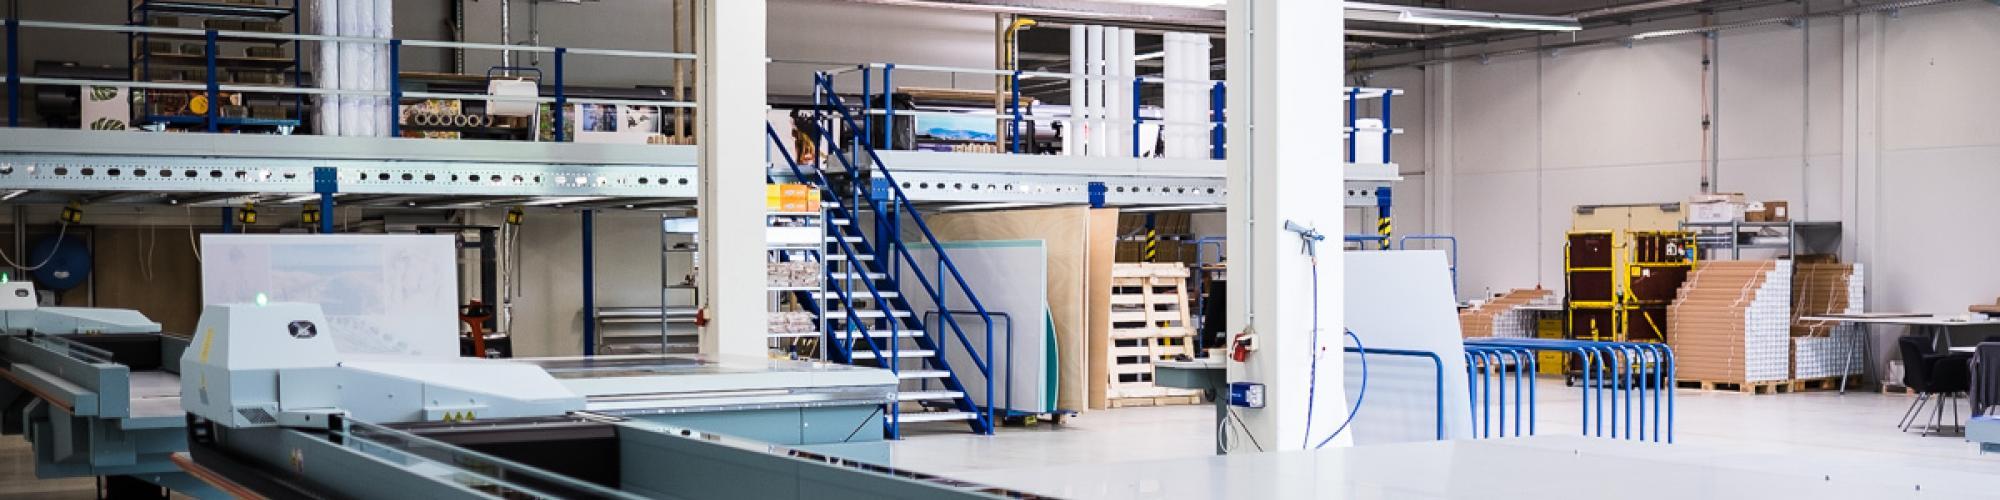 Posterlounge GmbH